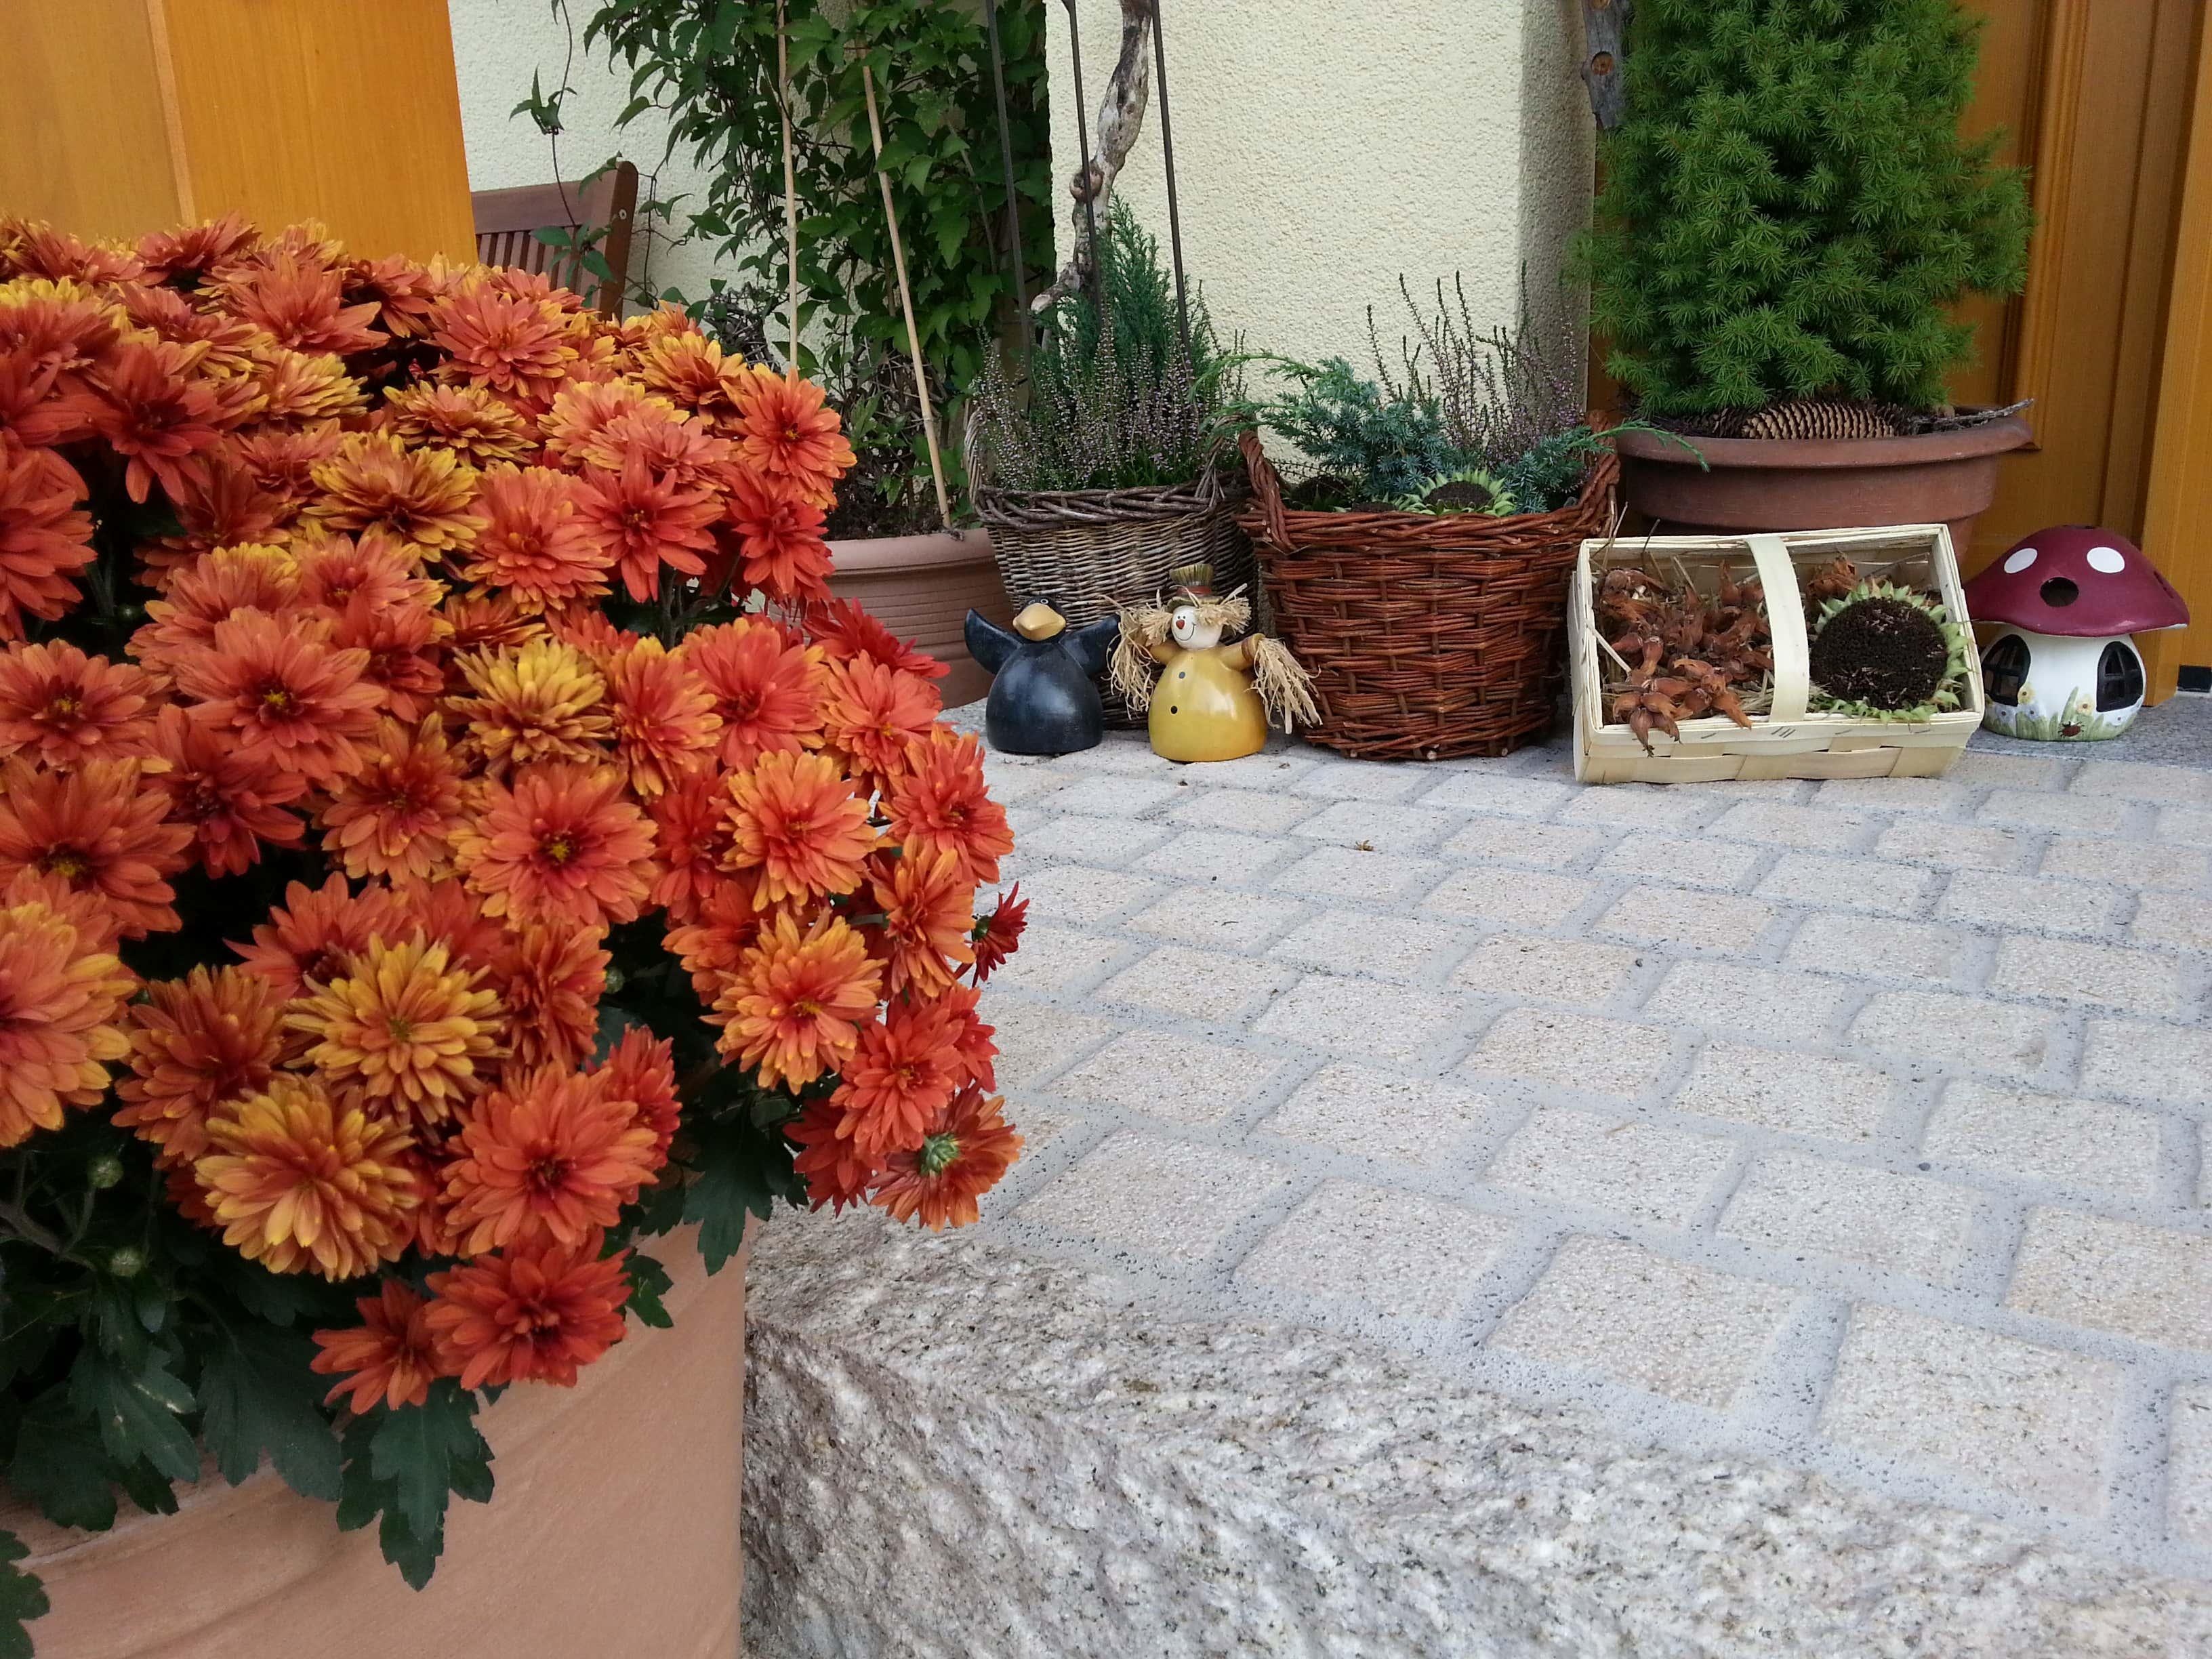 Herbstdeko ideen kreativ bunt den garten dekorieren for Garten blumen deko